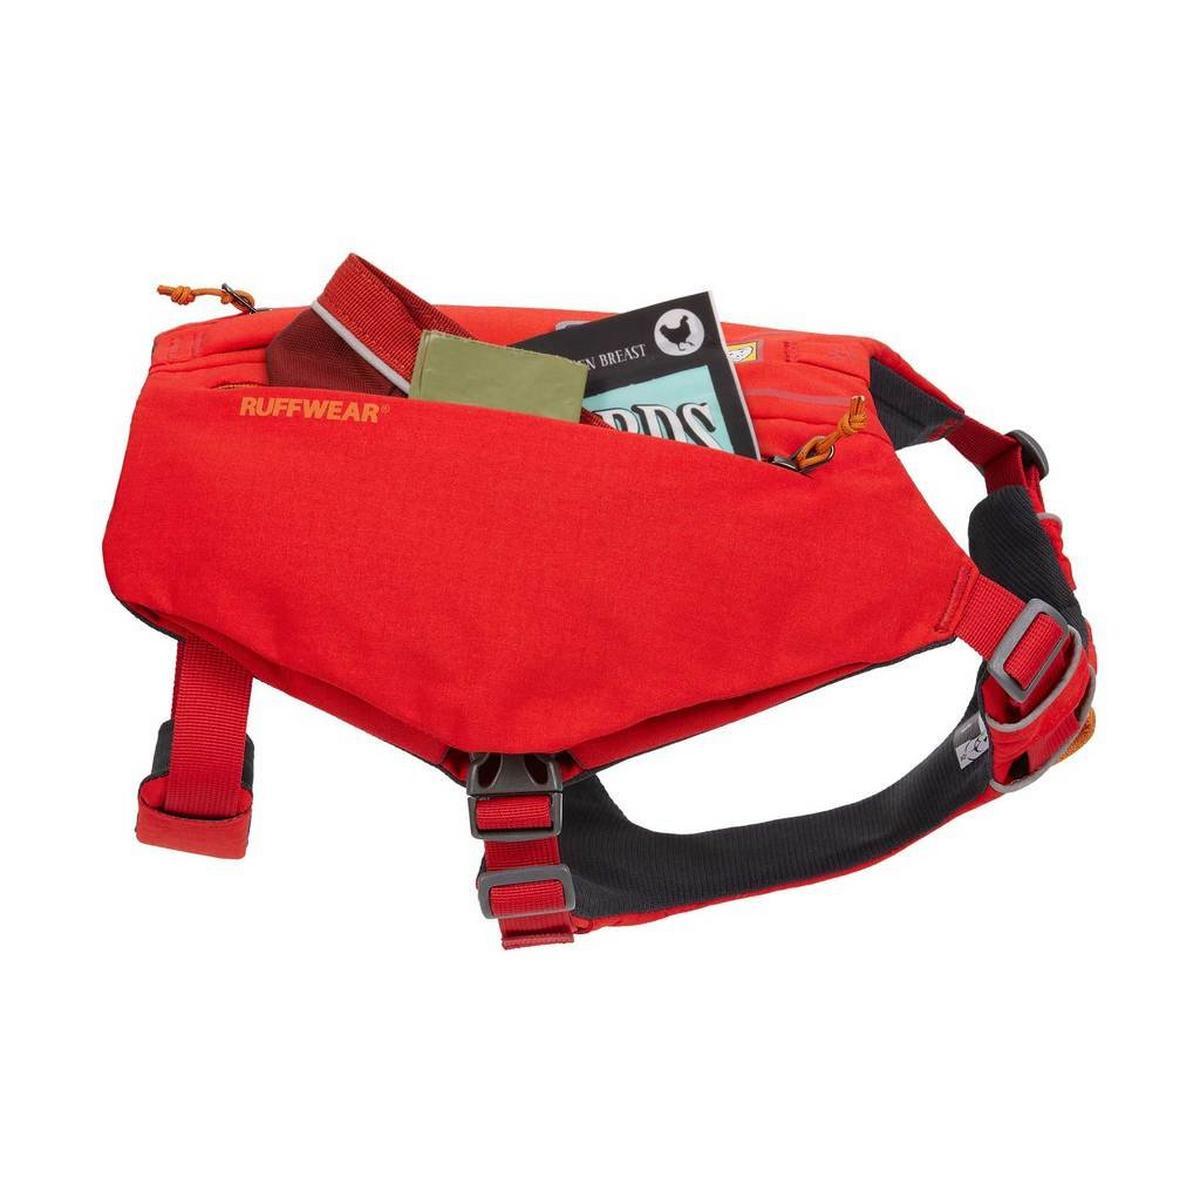 Ruffwear Switchbak Harness - Red Sumac